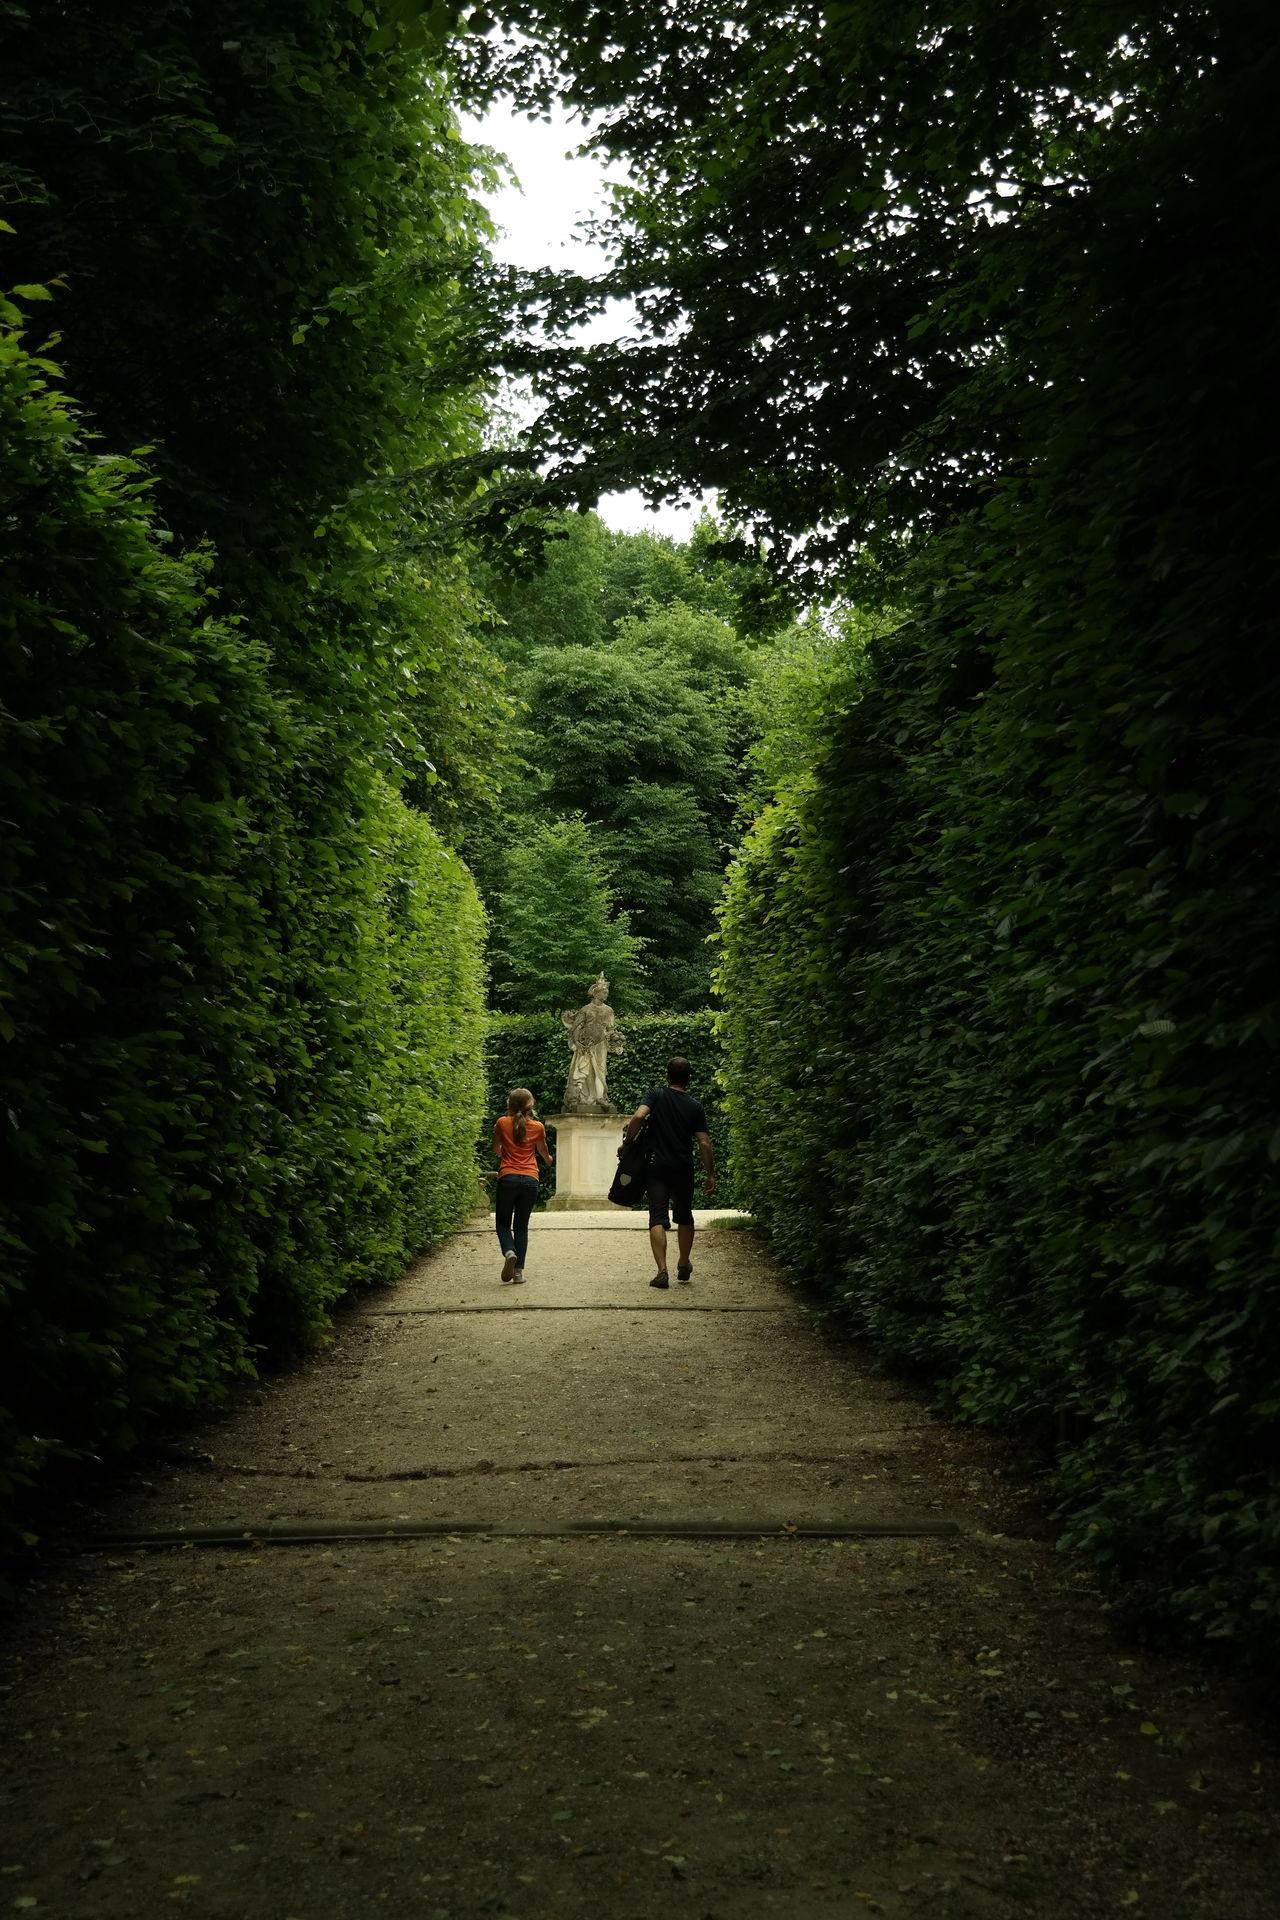 Dresden - Barock Statt Beton Dresden Dresden♡ Barock Barockgarten Großsedlitz Grün Walking Vater Und Tochter